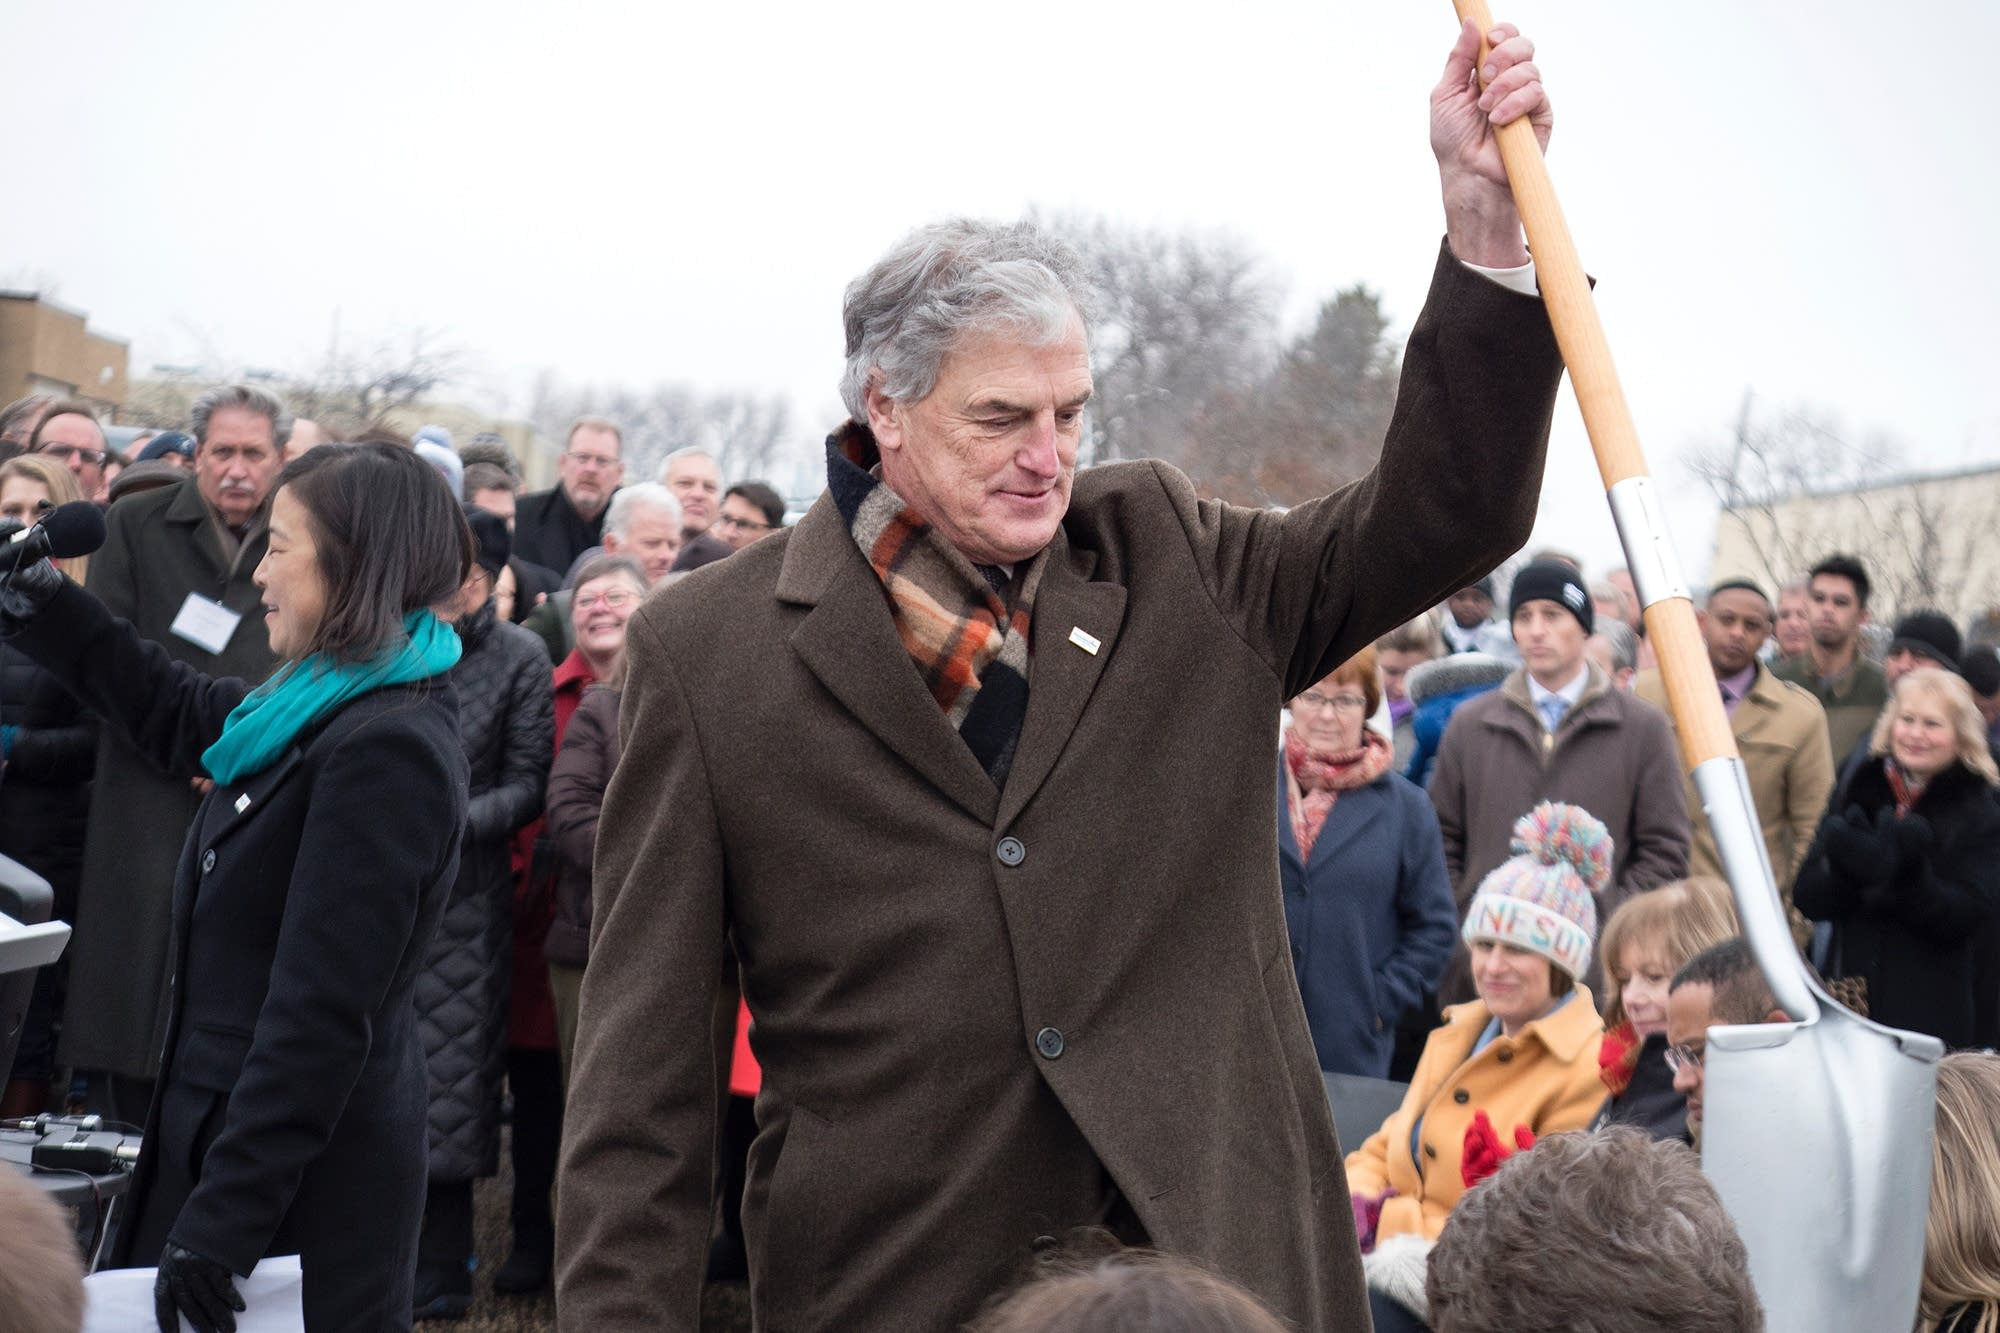 Peter McLaughlin brought his own shovel.